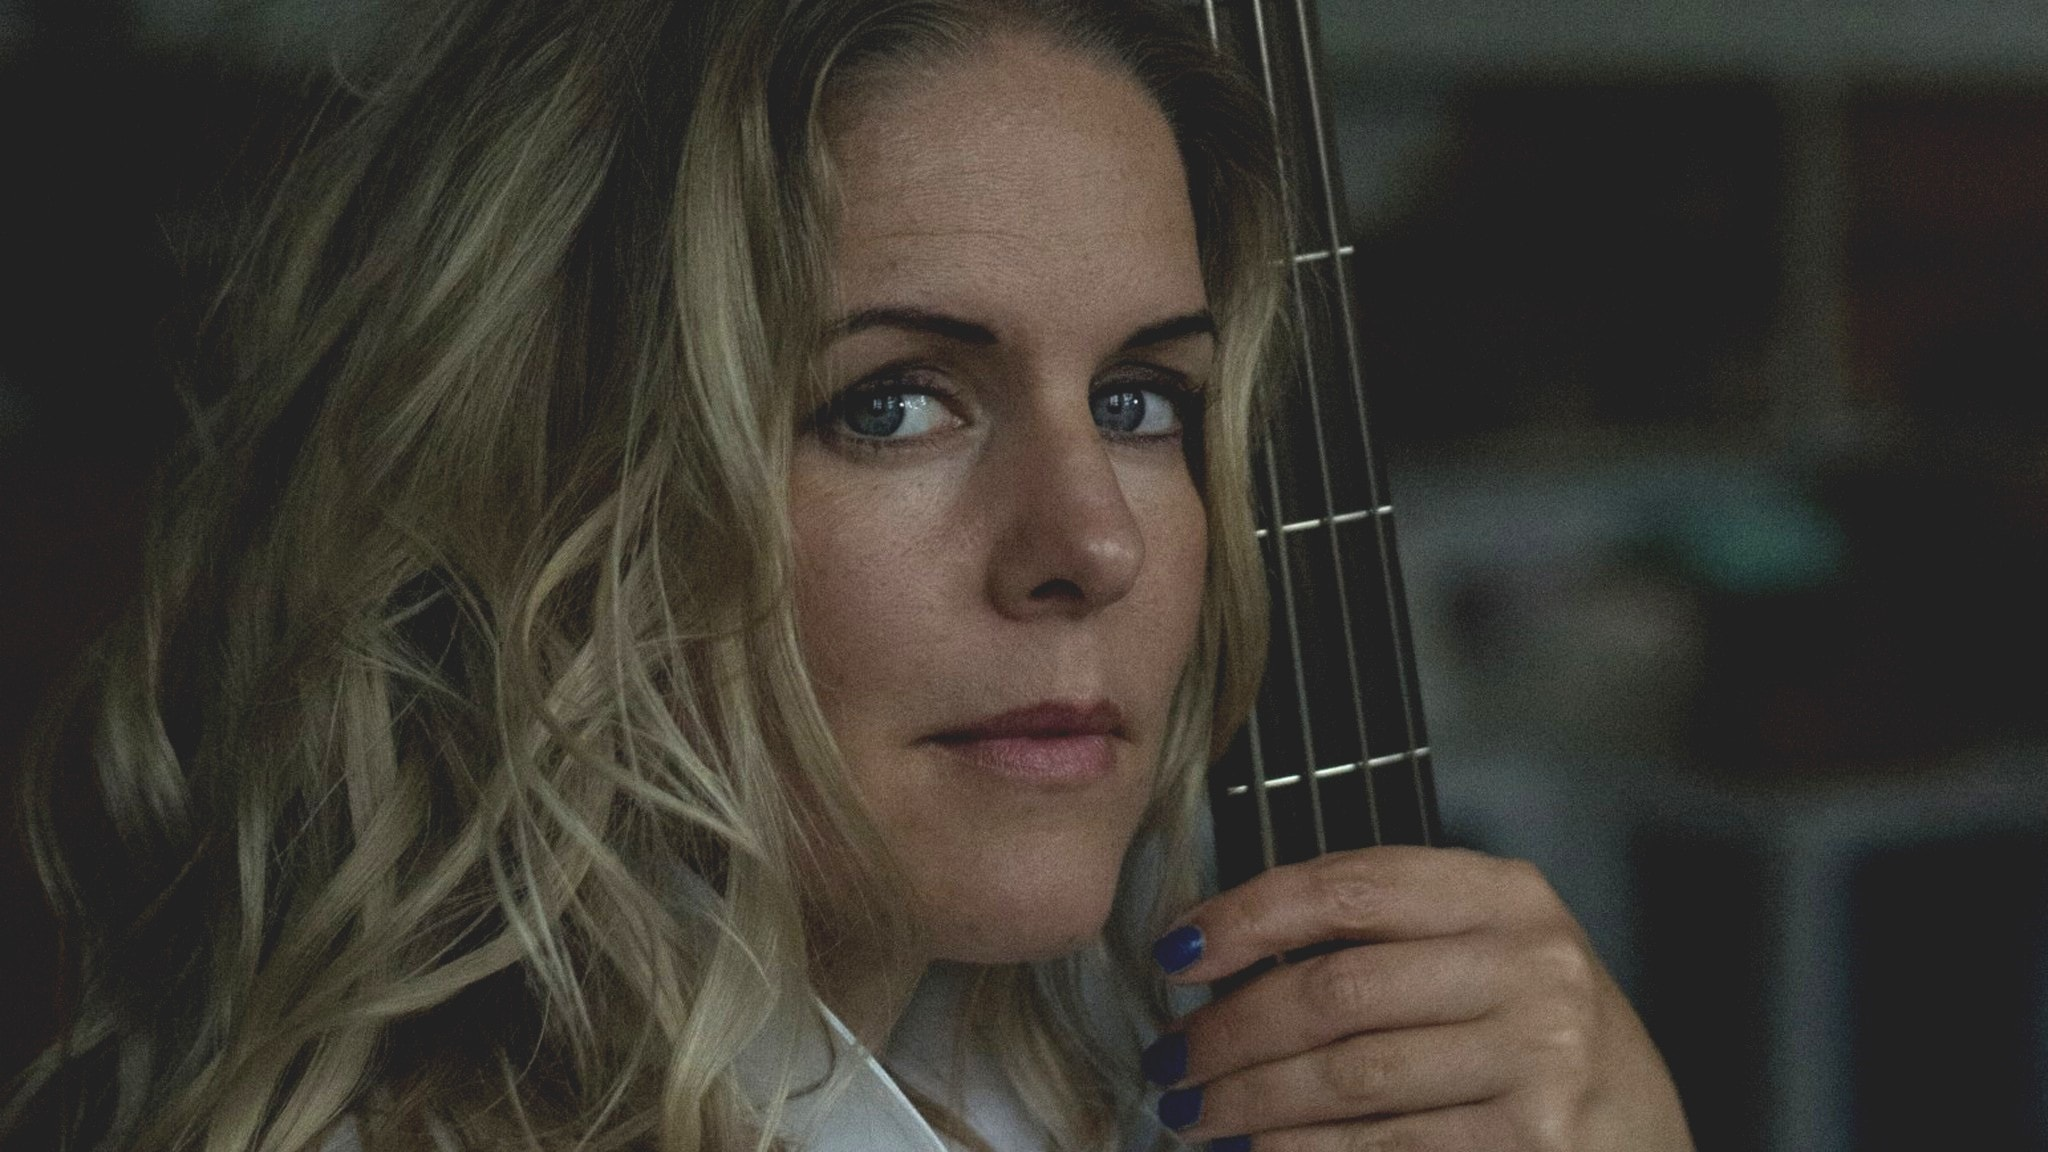 MIXTEJP: Sofia Karlssons irländska hjärta